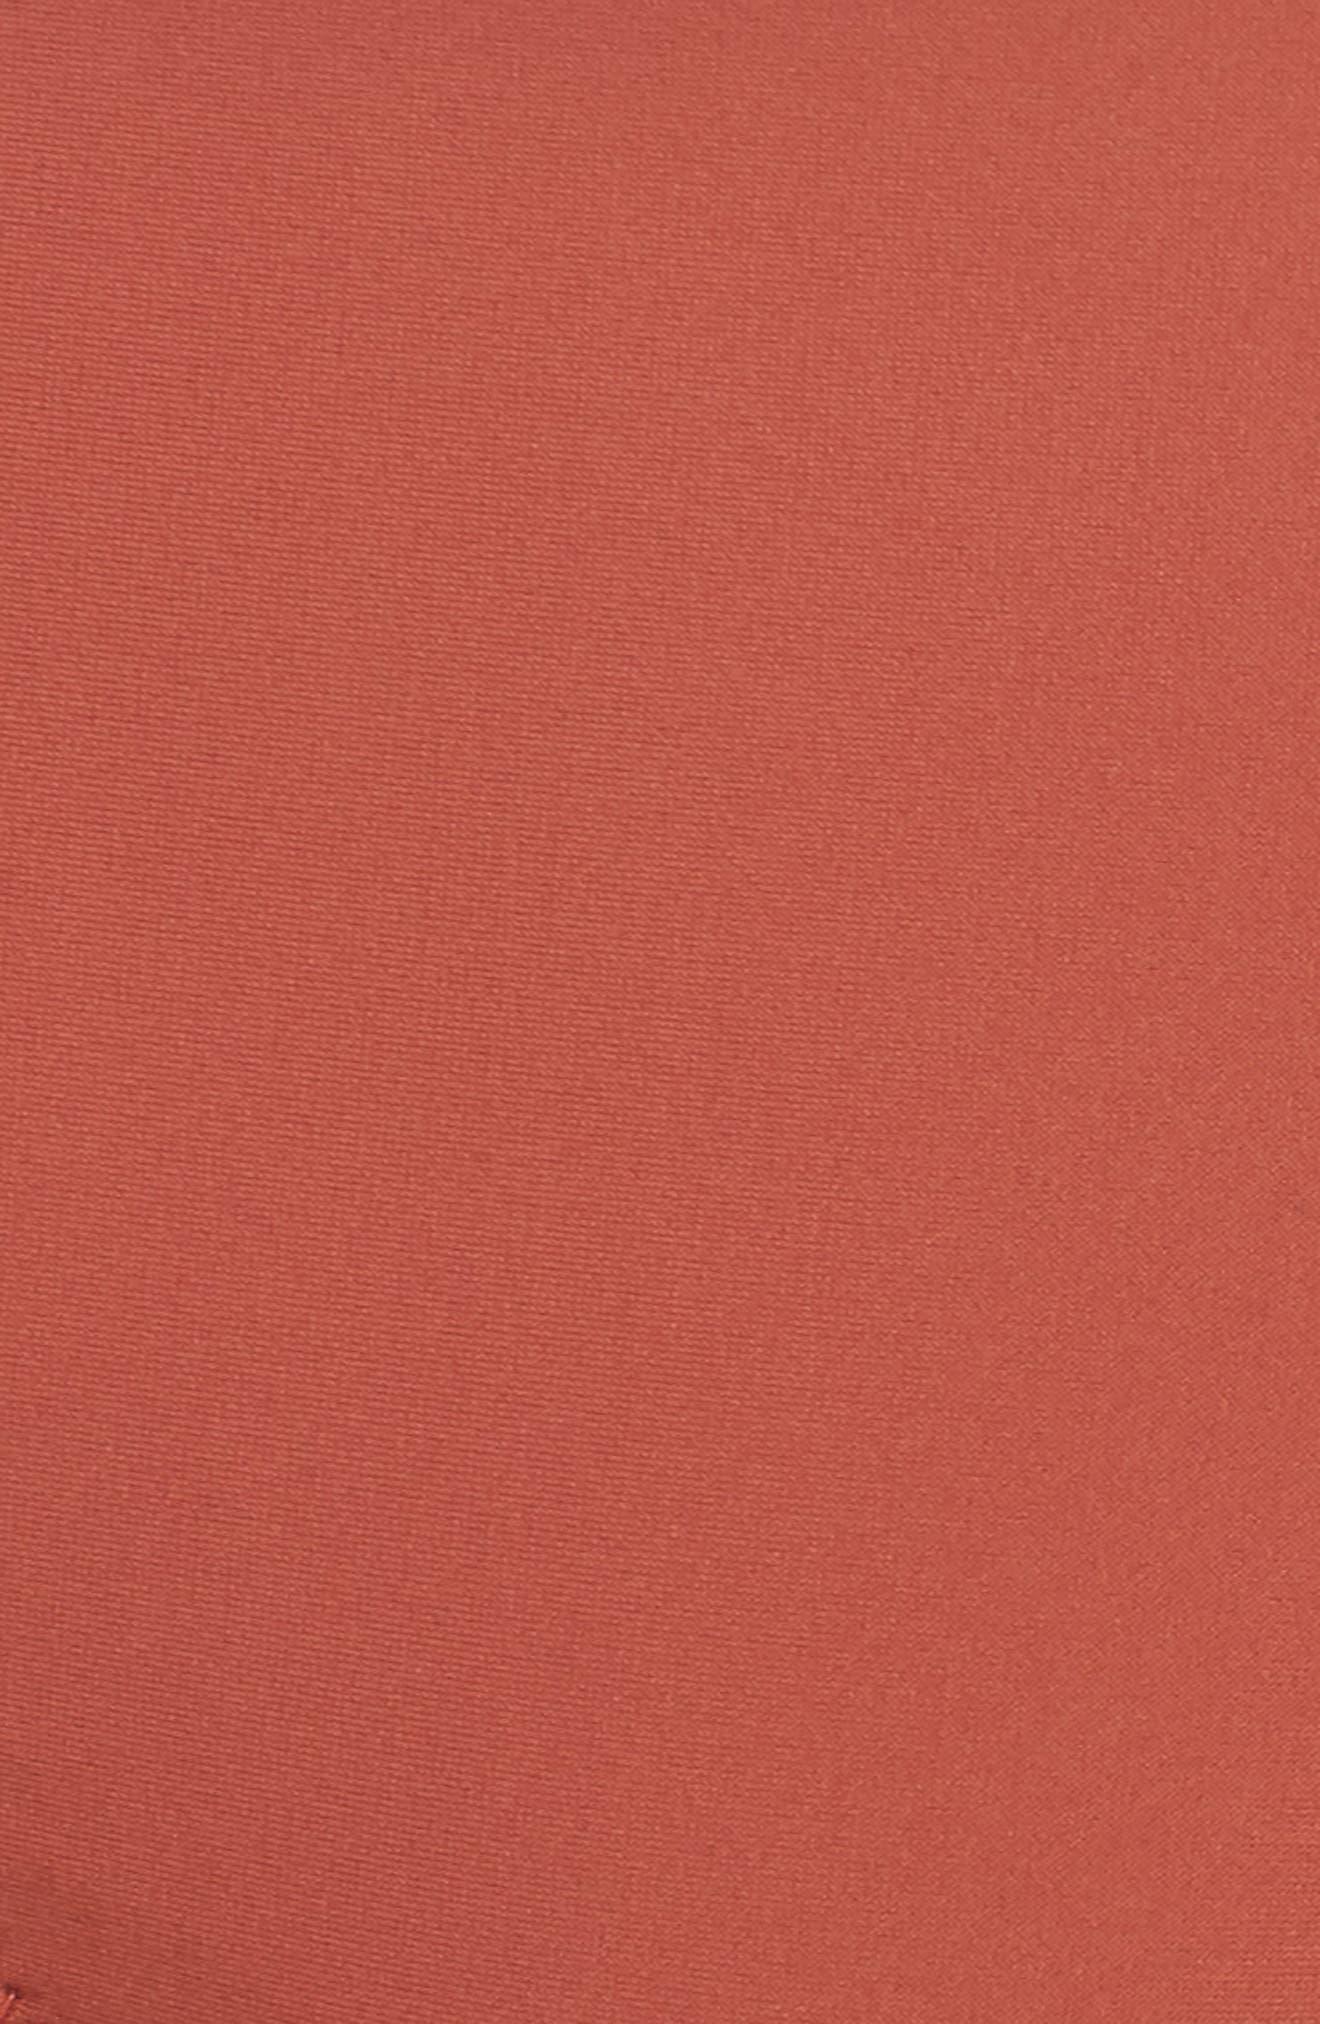 Fairfax Bandeau Bikini Top,                             Alternate thumbnail 8, color,                             Copper